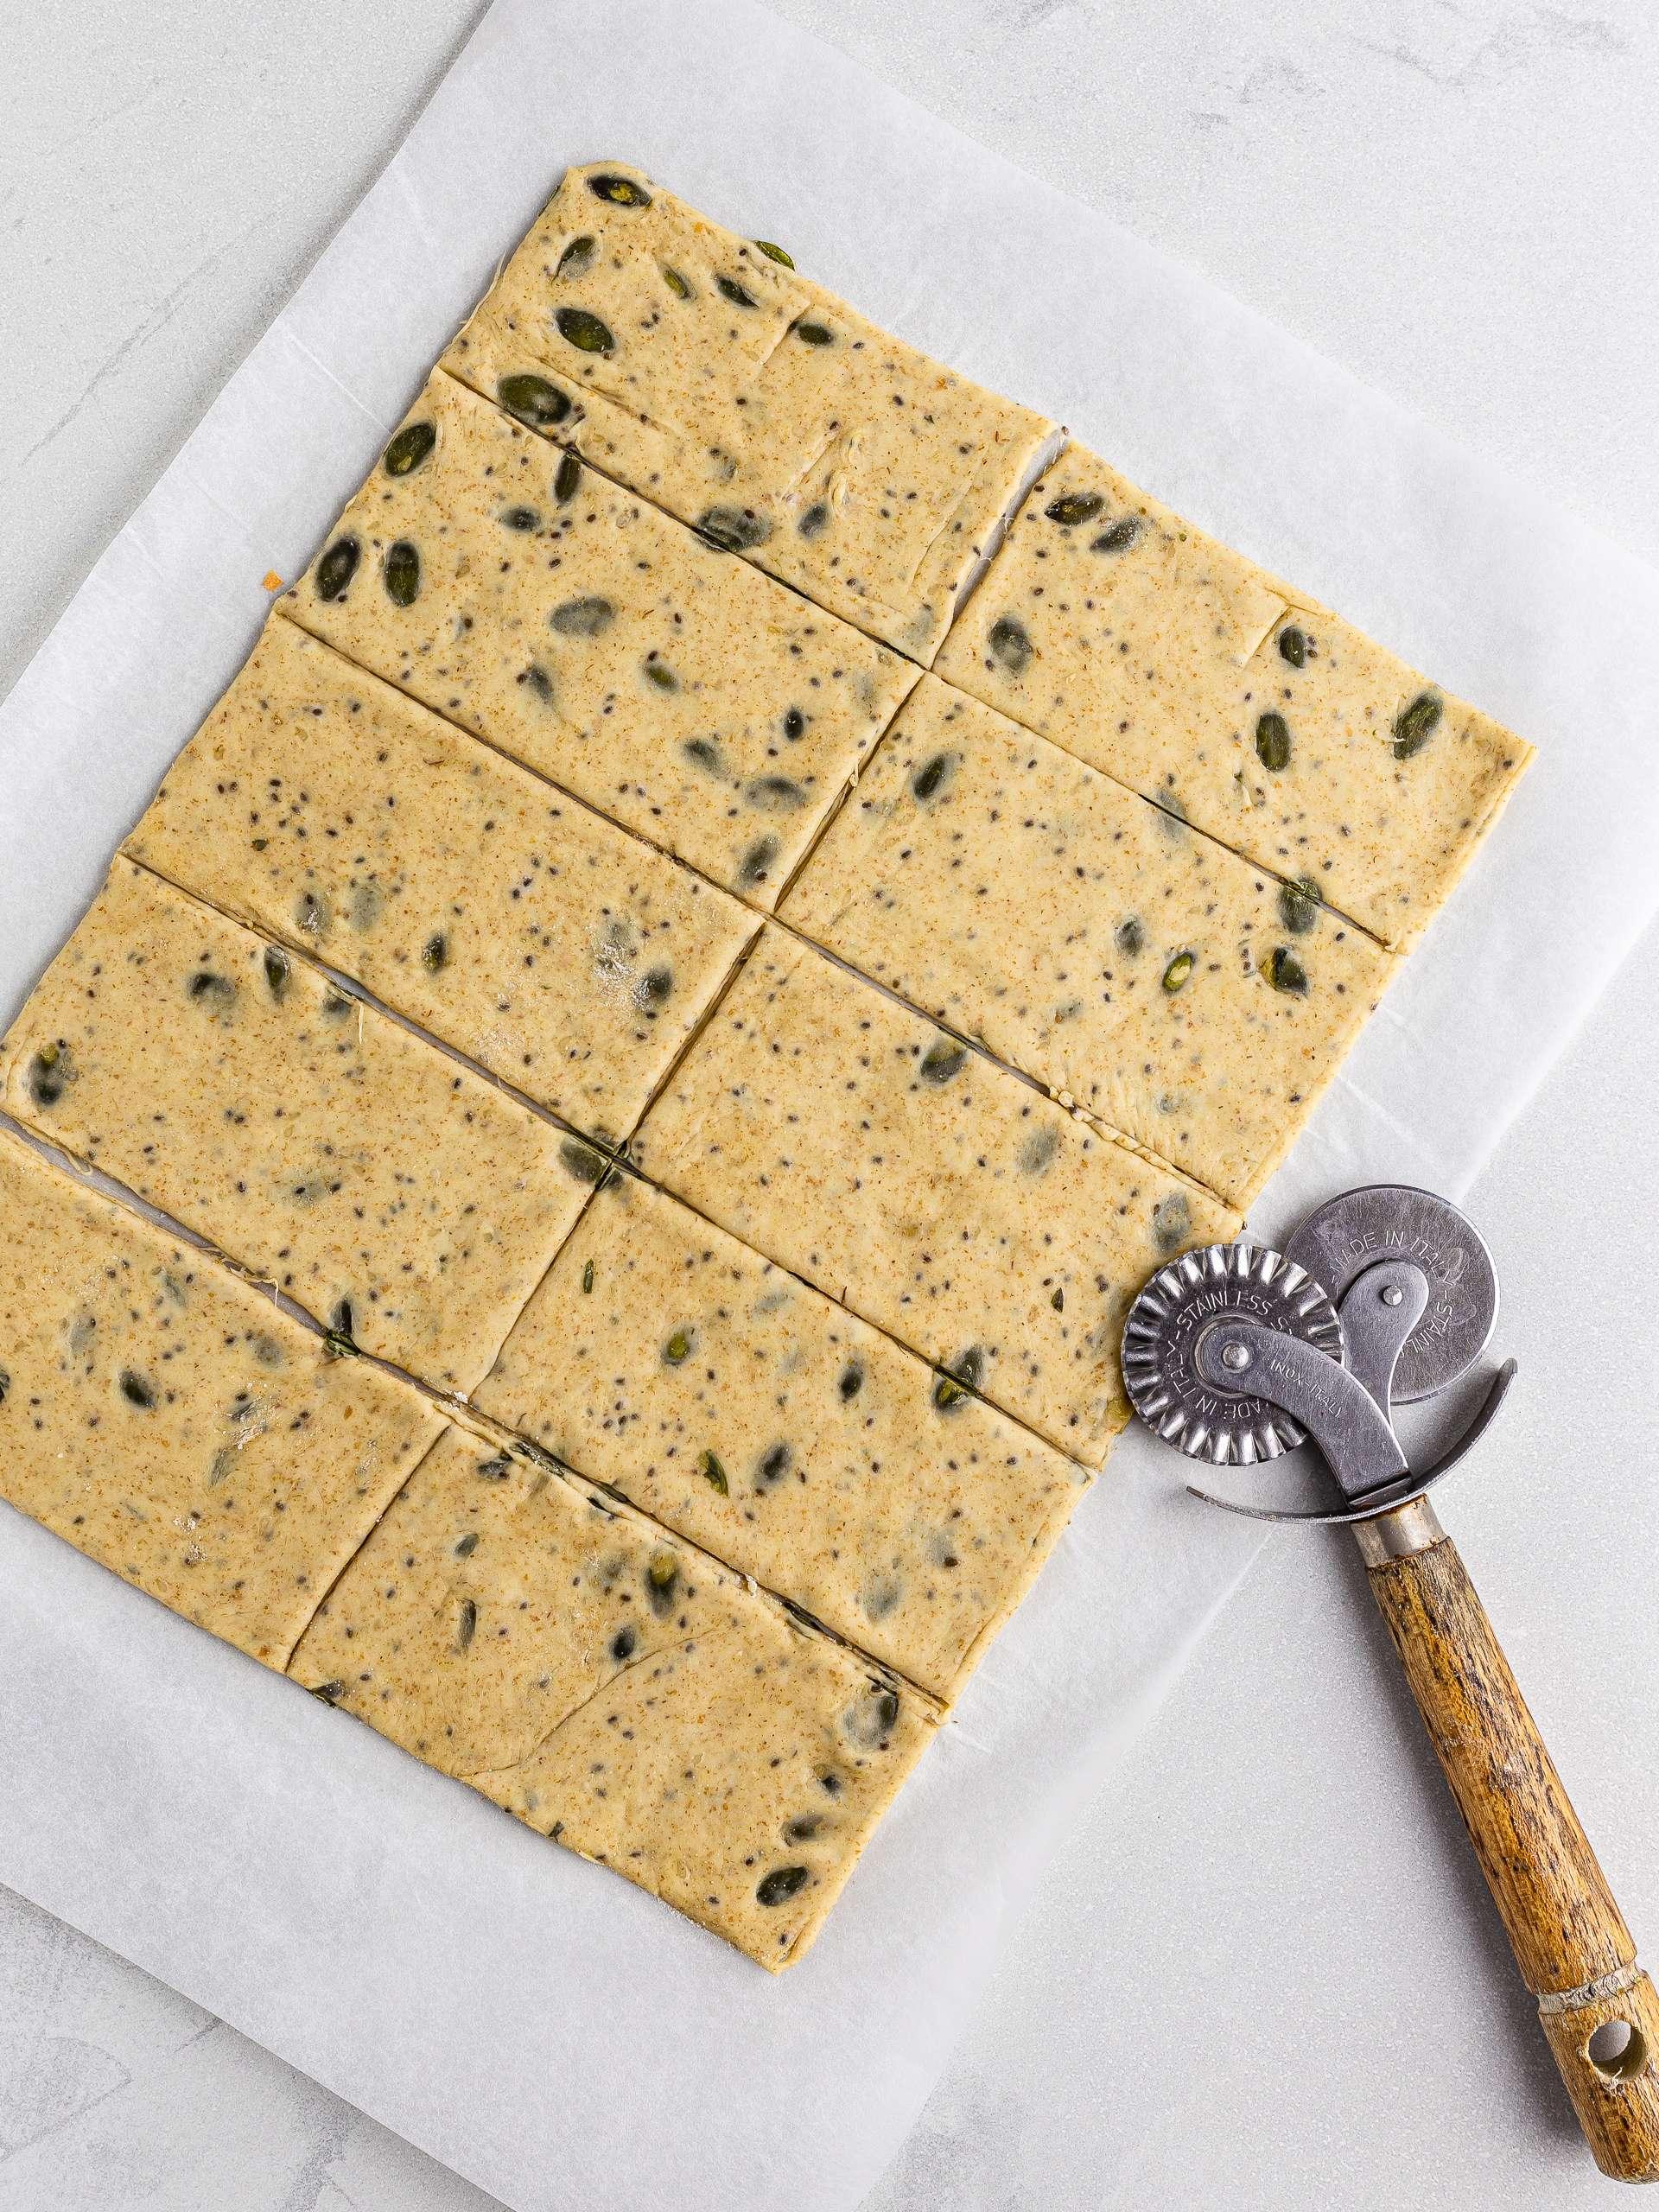 spelt crackers dough cut into rectangles